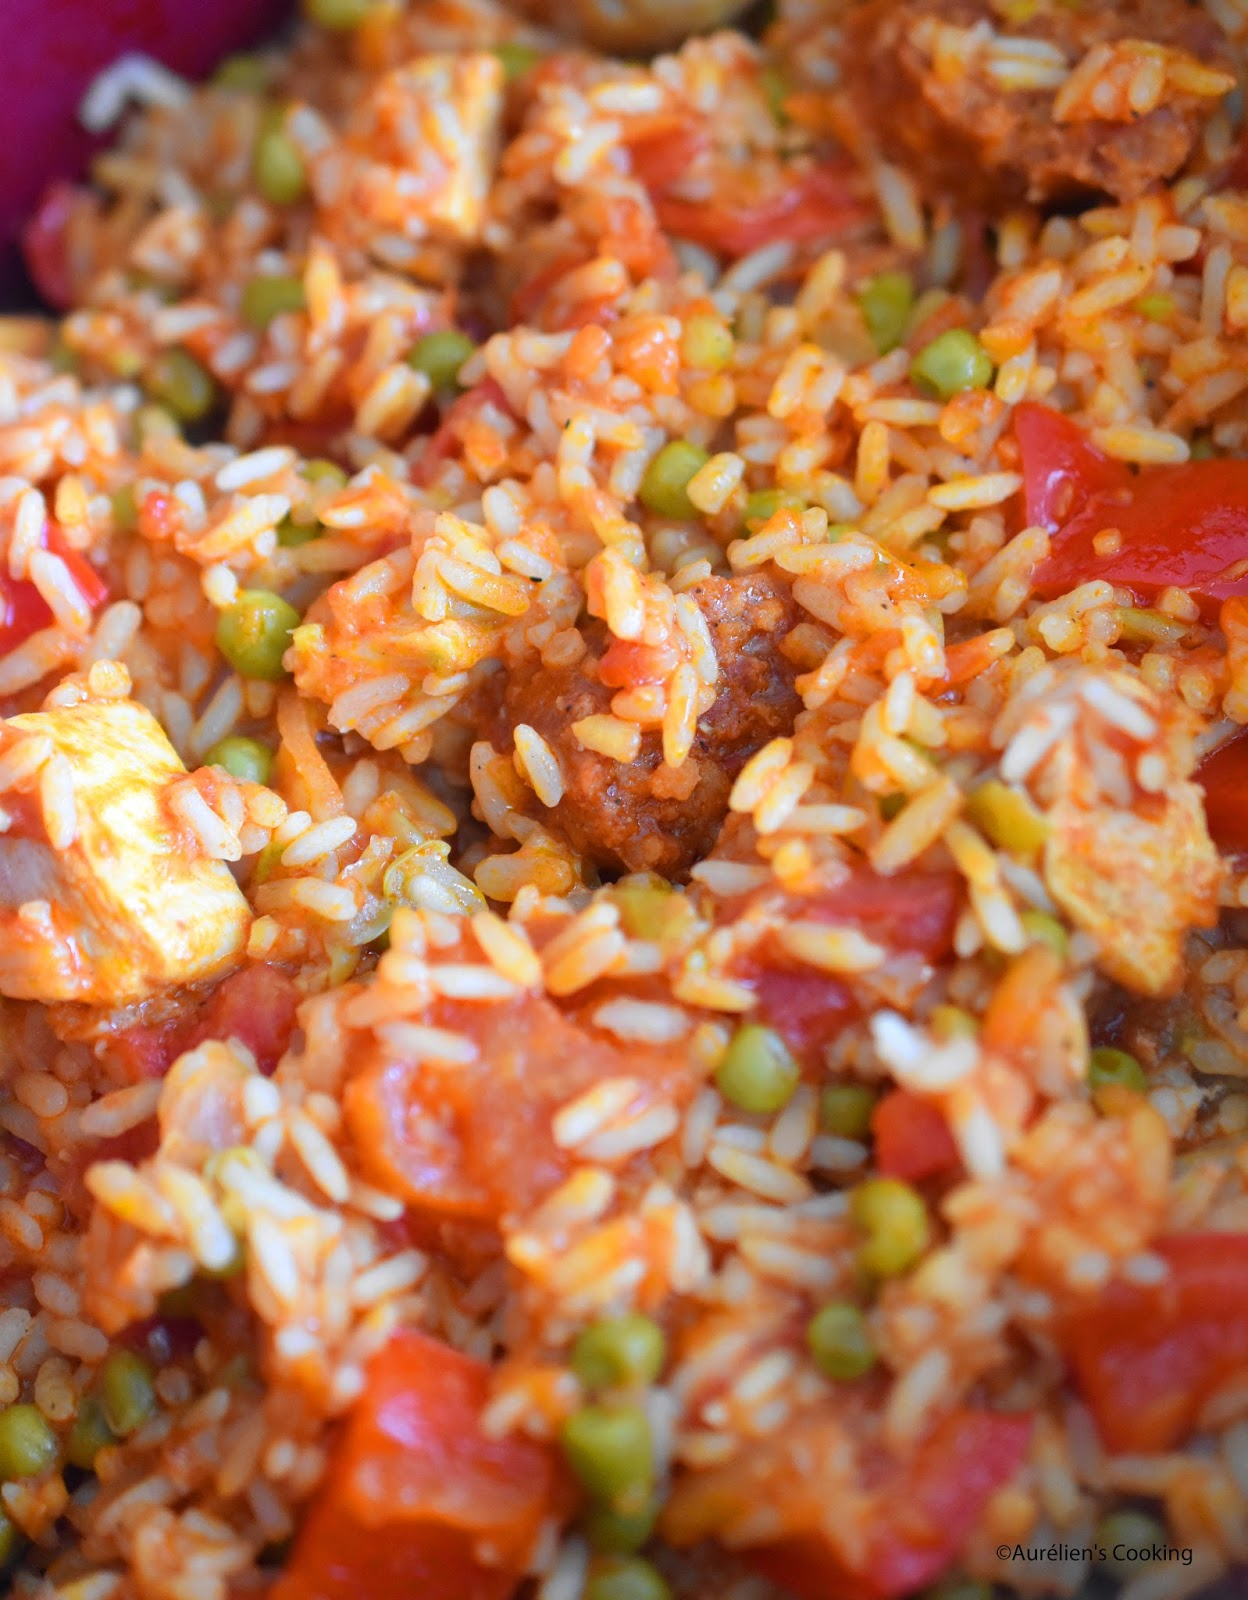 Connu Aurélien's Cooking: Paëlla carnivore express au Micro Minute  PA48